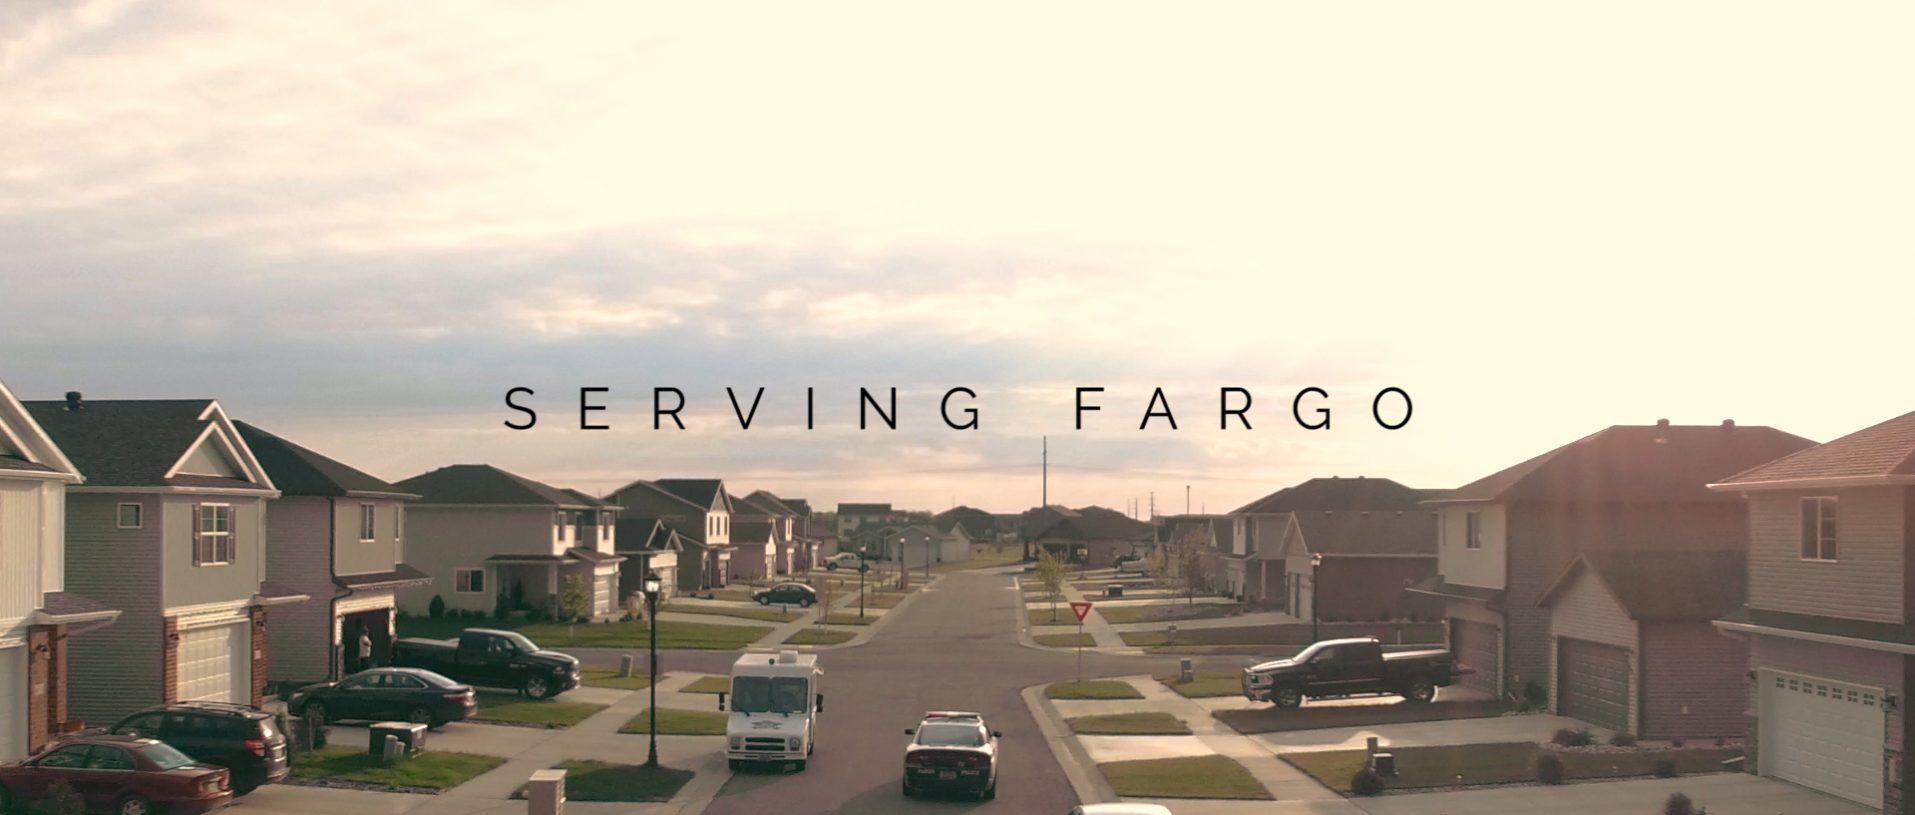 Serving Fargo | Fargo Police Department